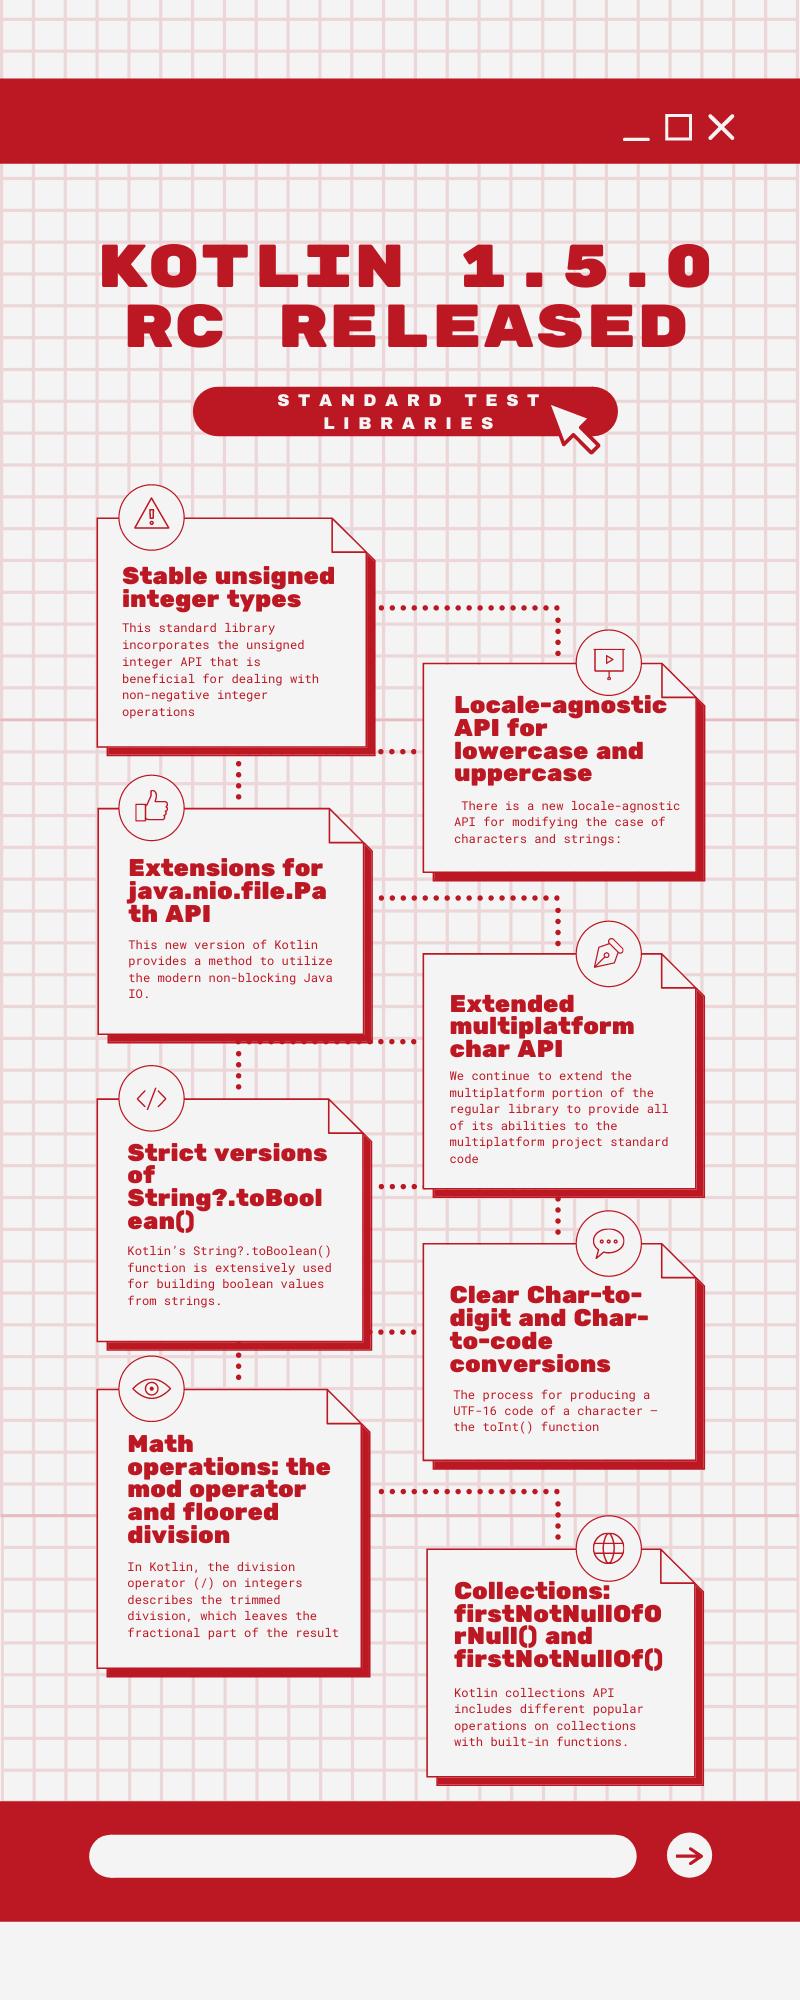 kotlin released infographic